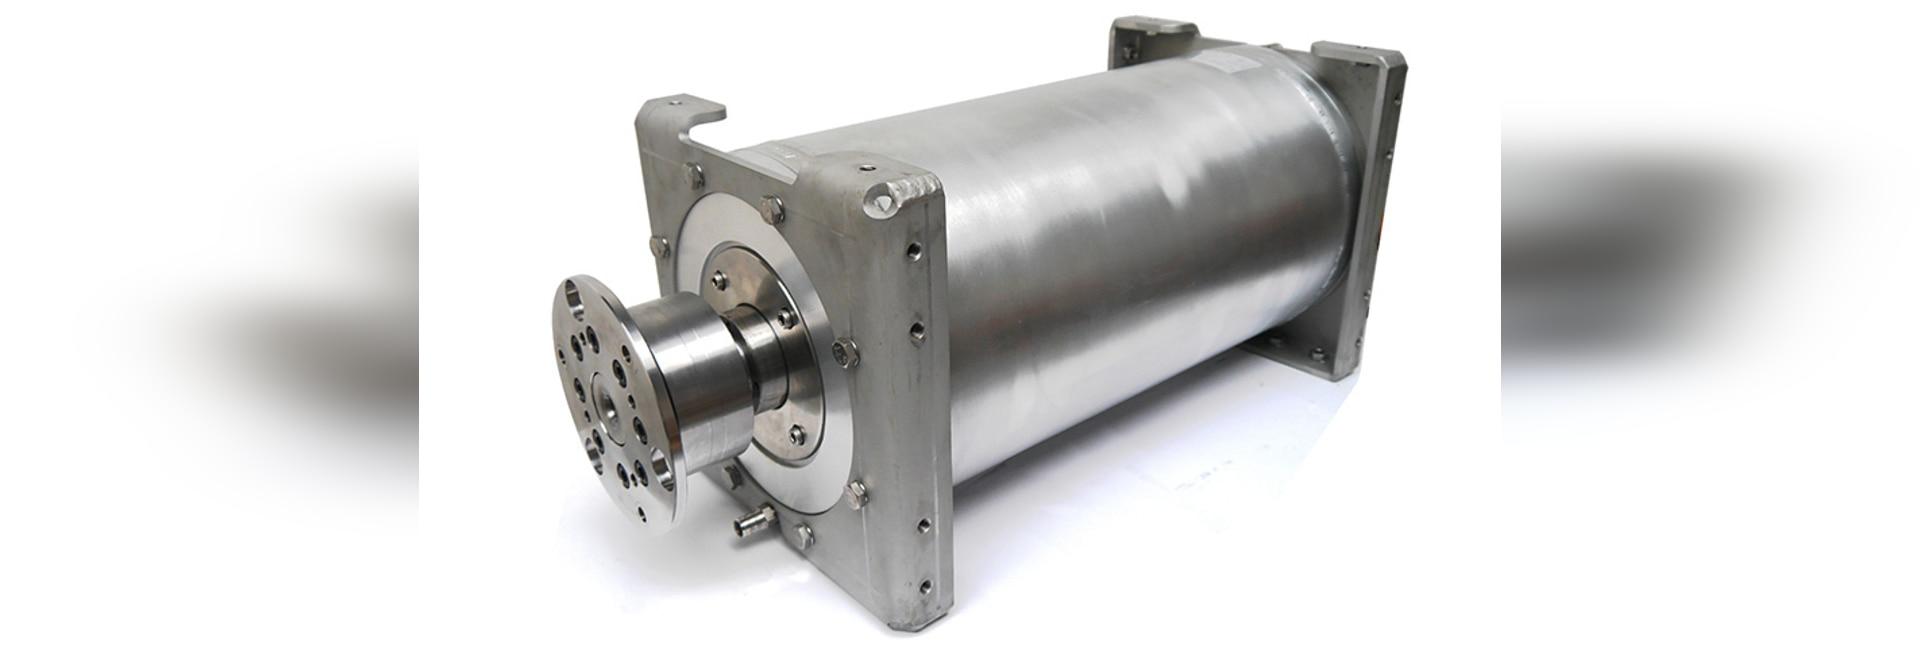 Panda de Fischer motor eléctrico de 100 kilovatios para 360 sistemas de alto voltaje de V EasyBox